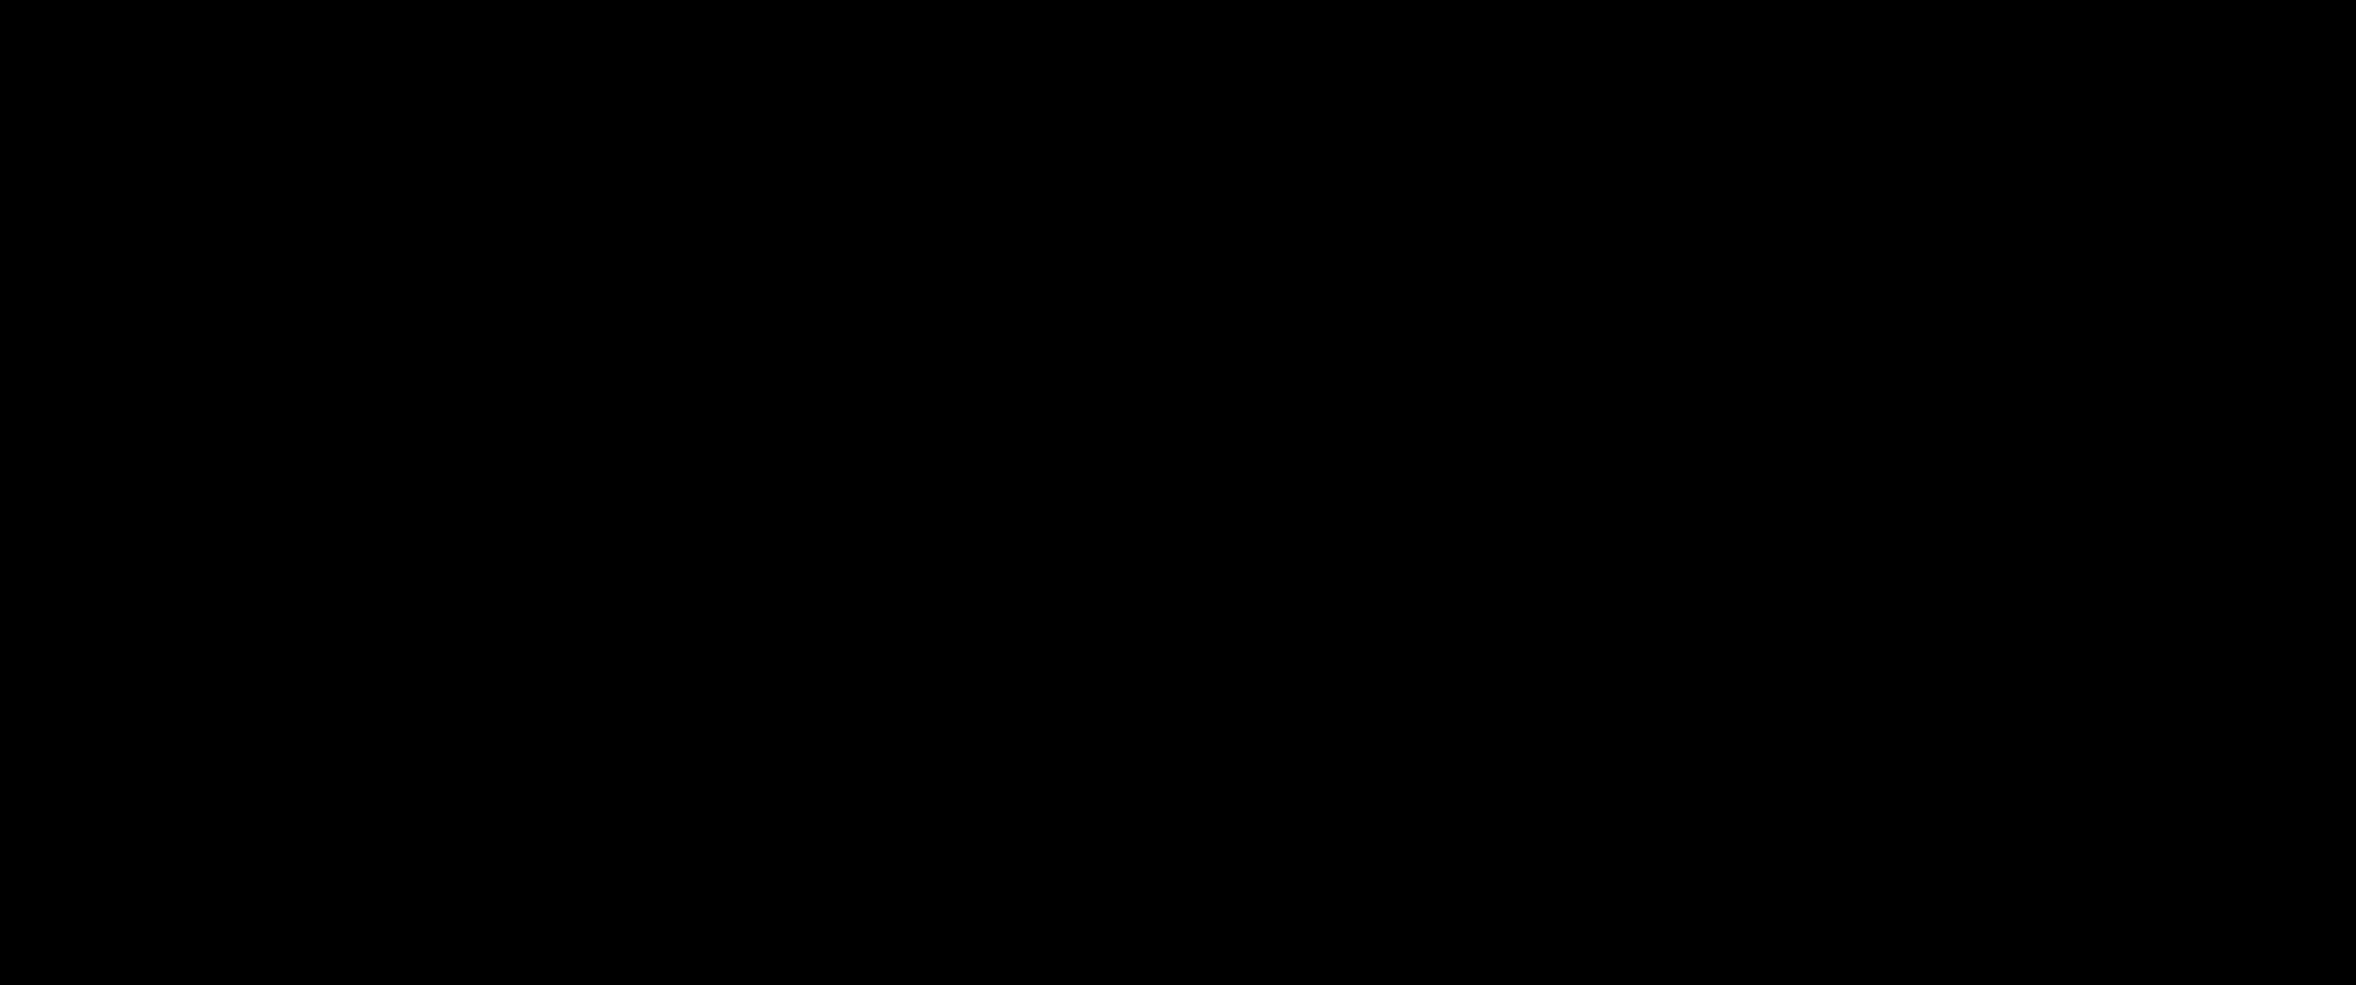 S_0004